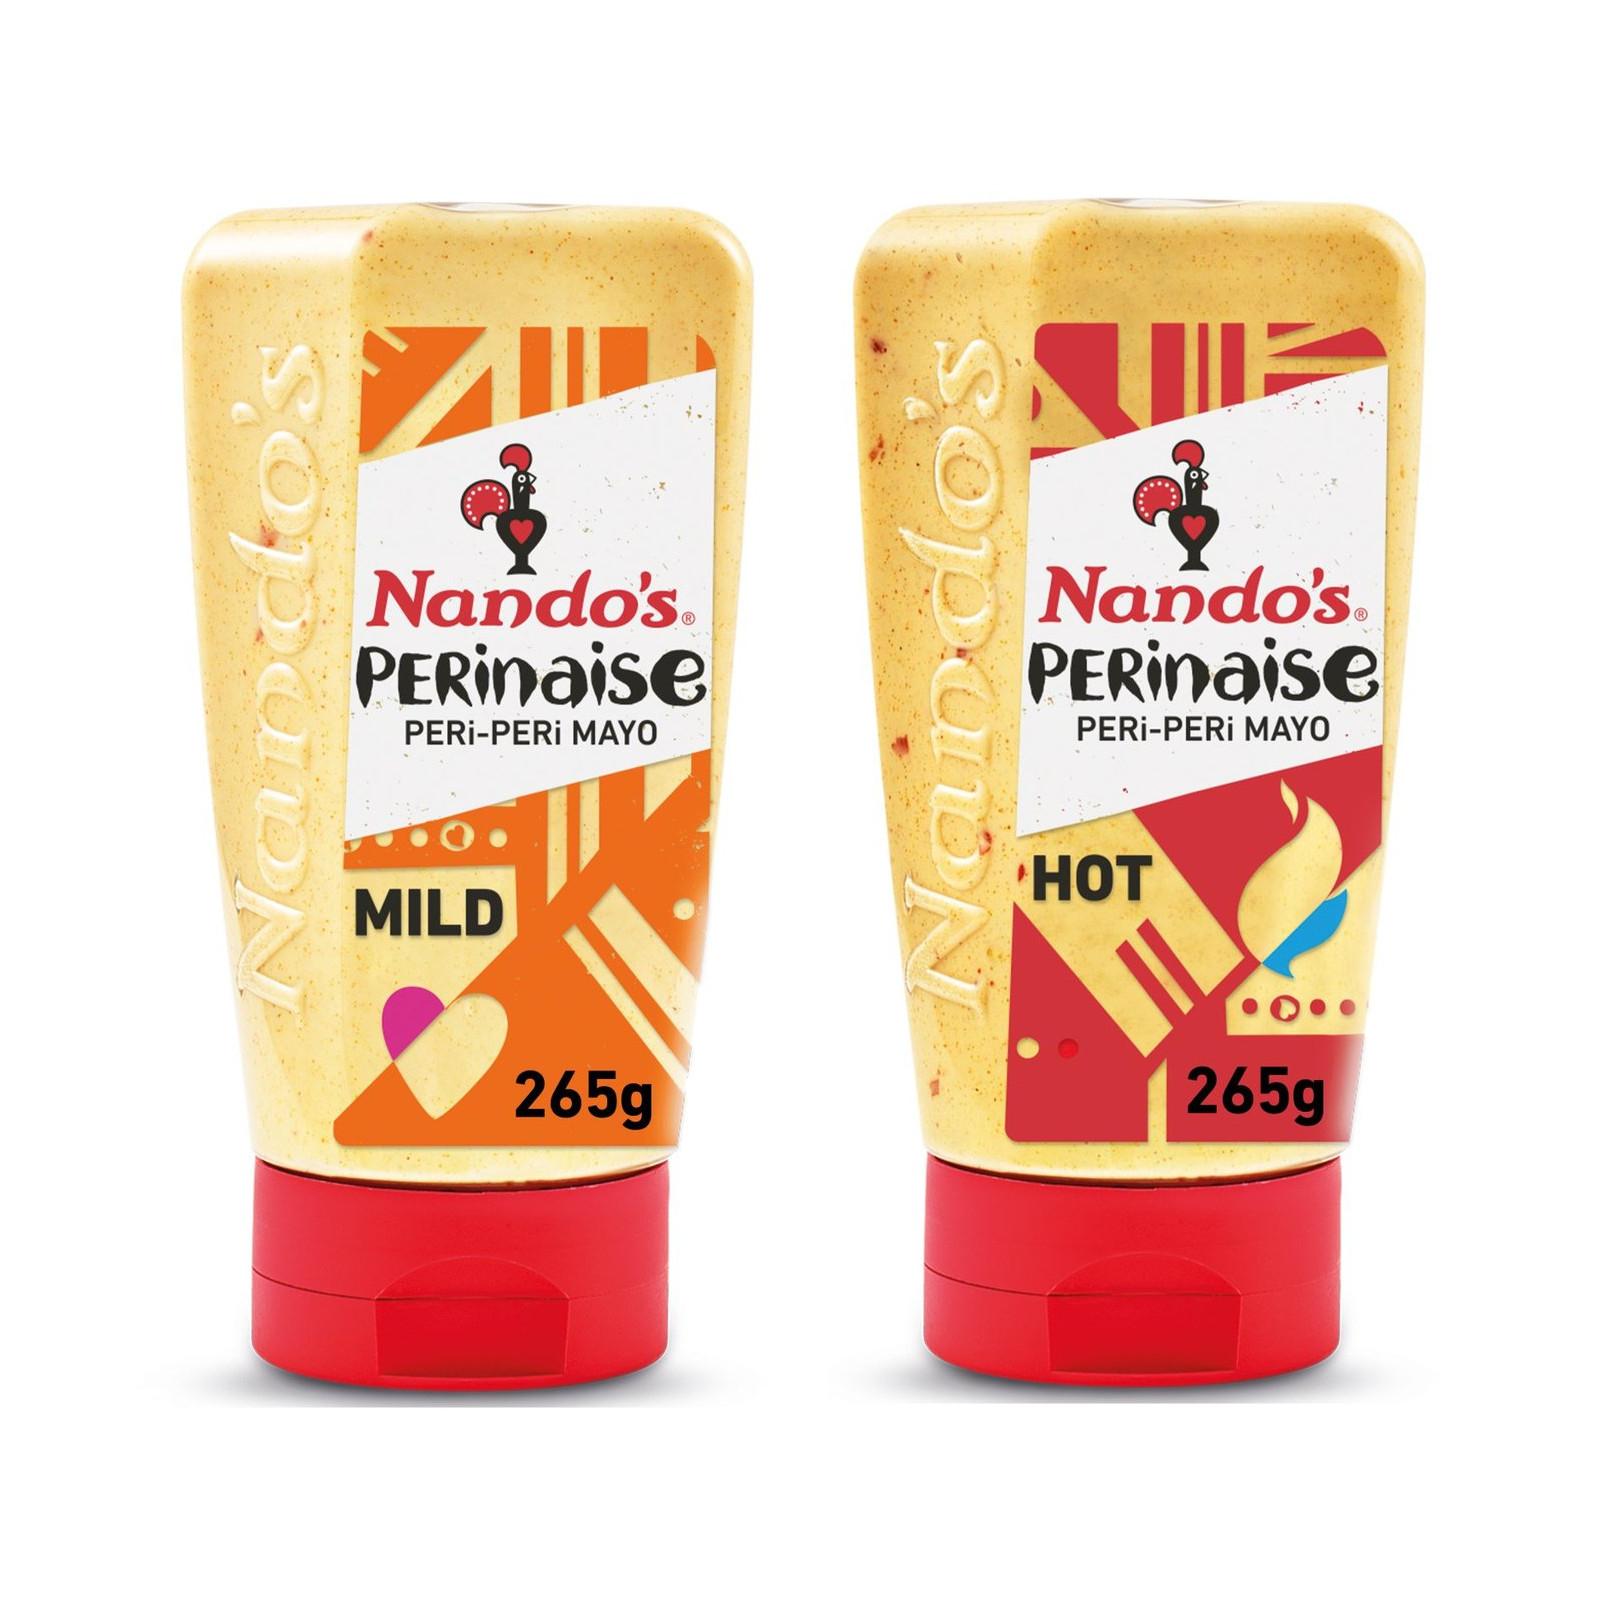 Nando's Perinaise Peri Peri Mayonnaise Mild or Hot 265g - £1.50 each @ Morrisons